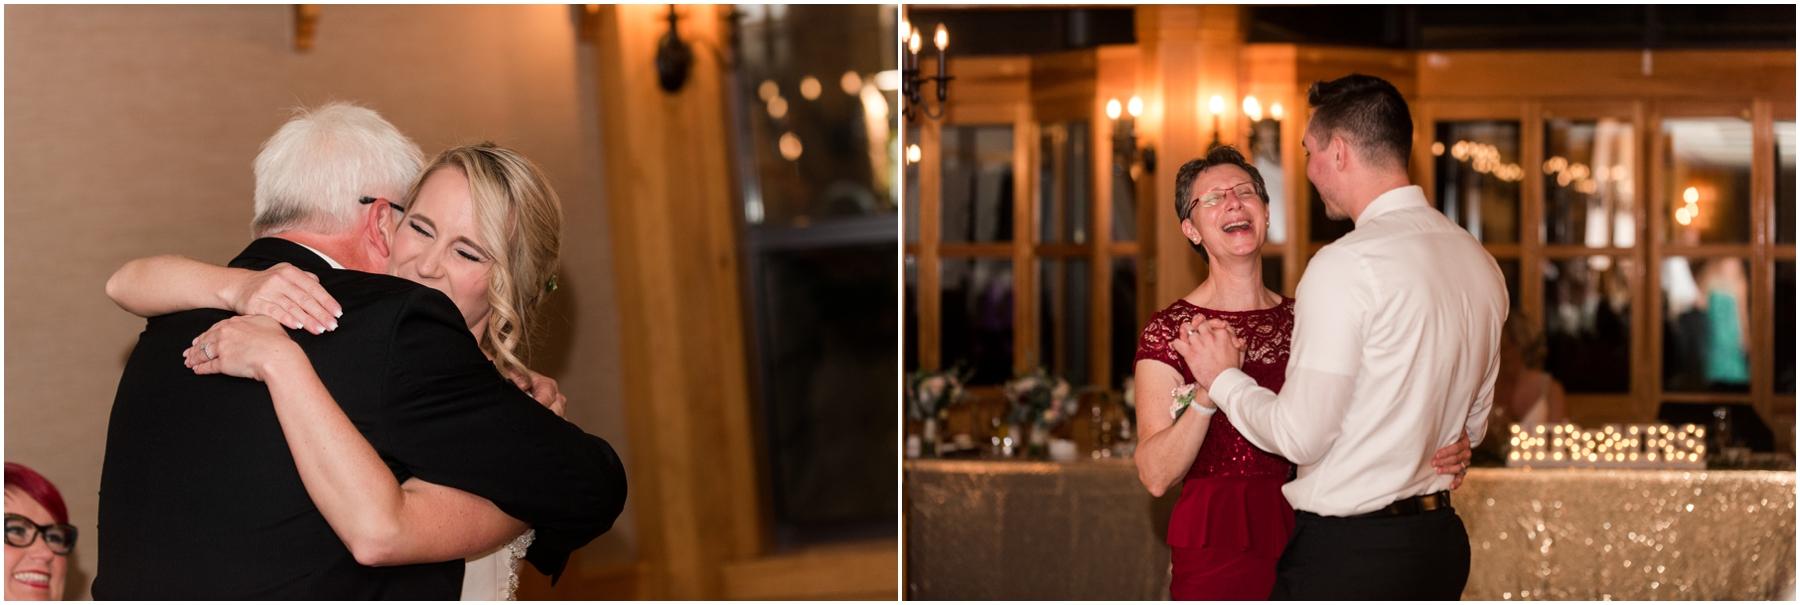 Black Creek Pioneer Village, Toronto Wedding- Precious Photography by Courtney McIntosh Becky & Andy_0207